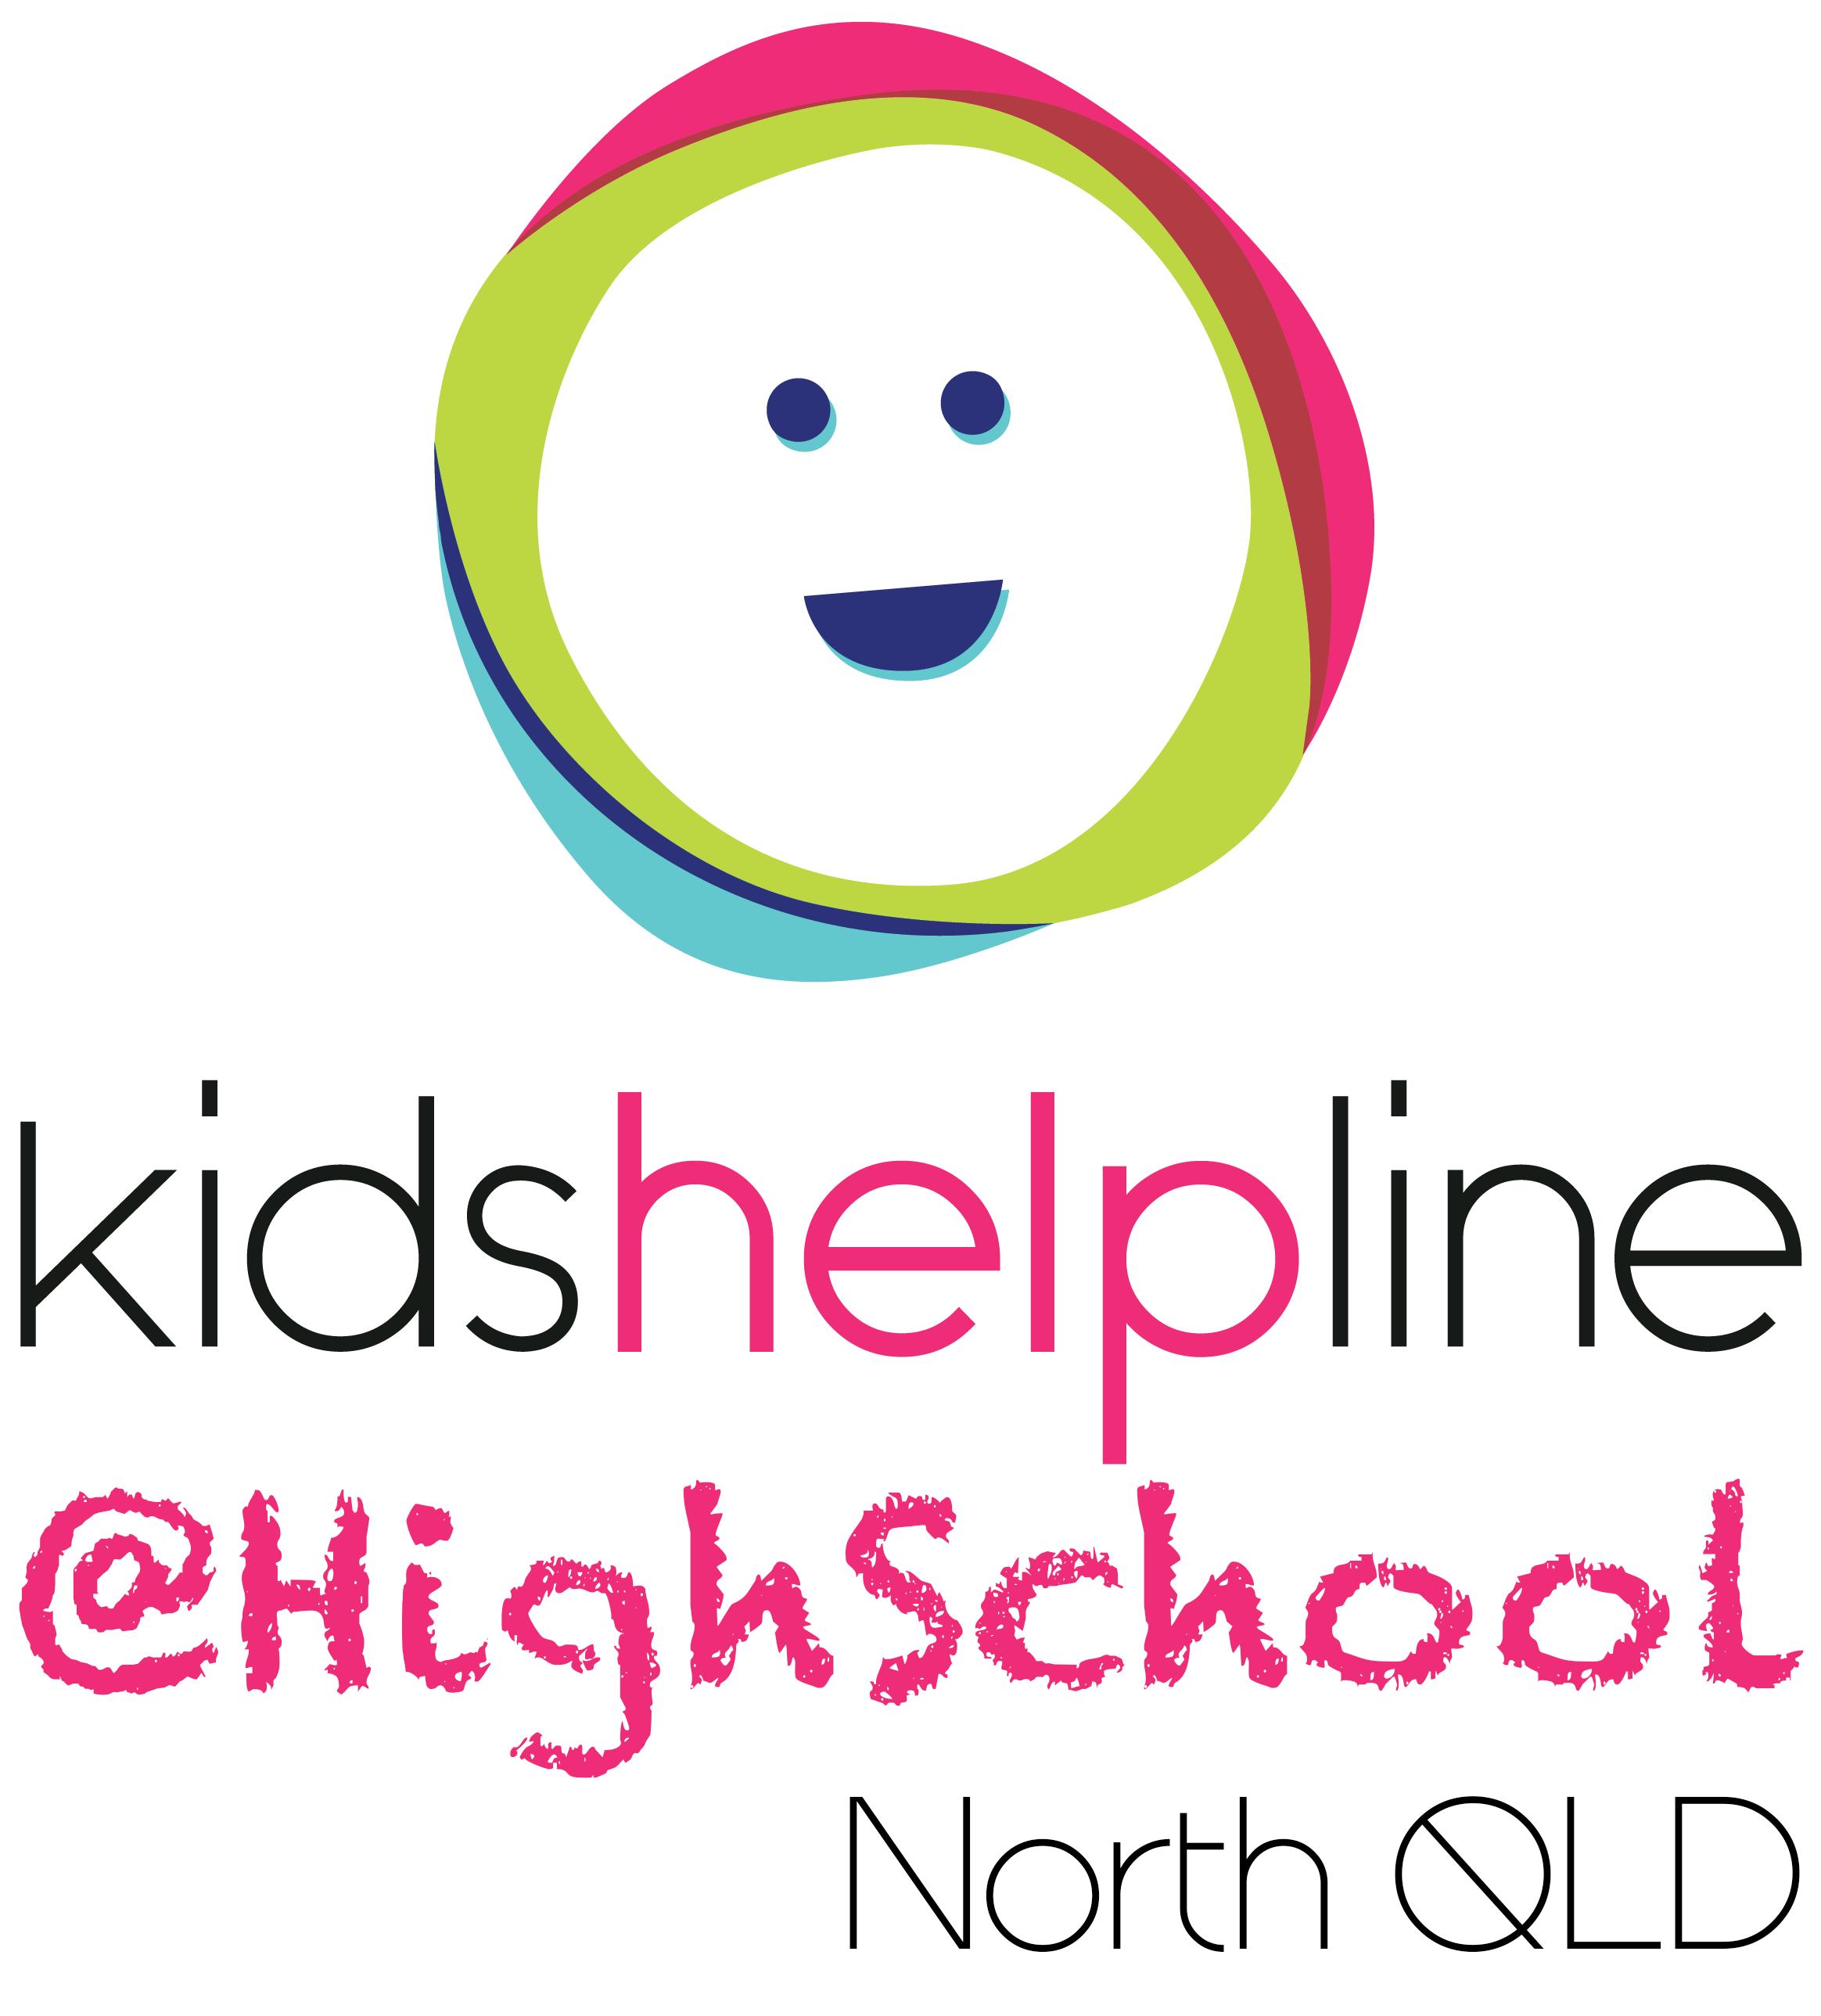 Kids Helpline @ High School (North QLD) logo